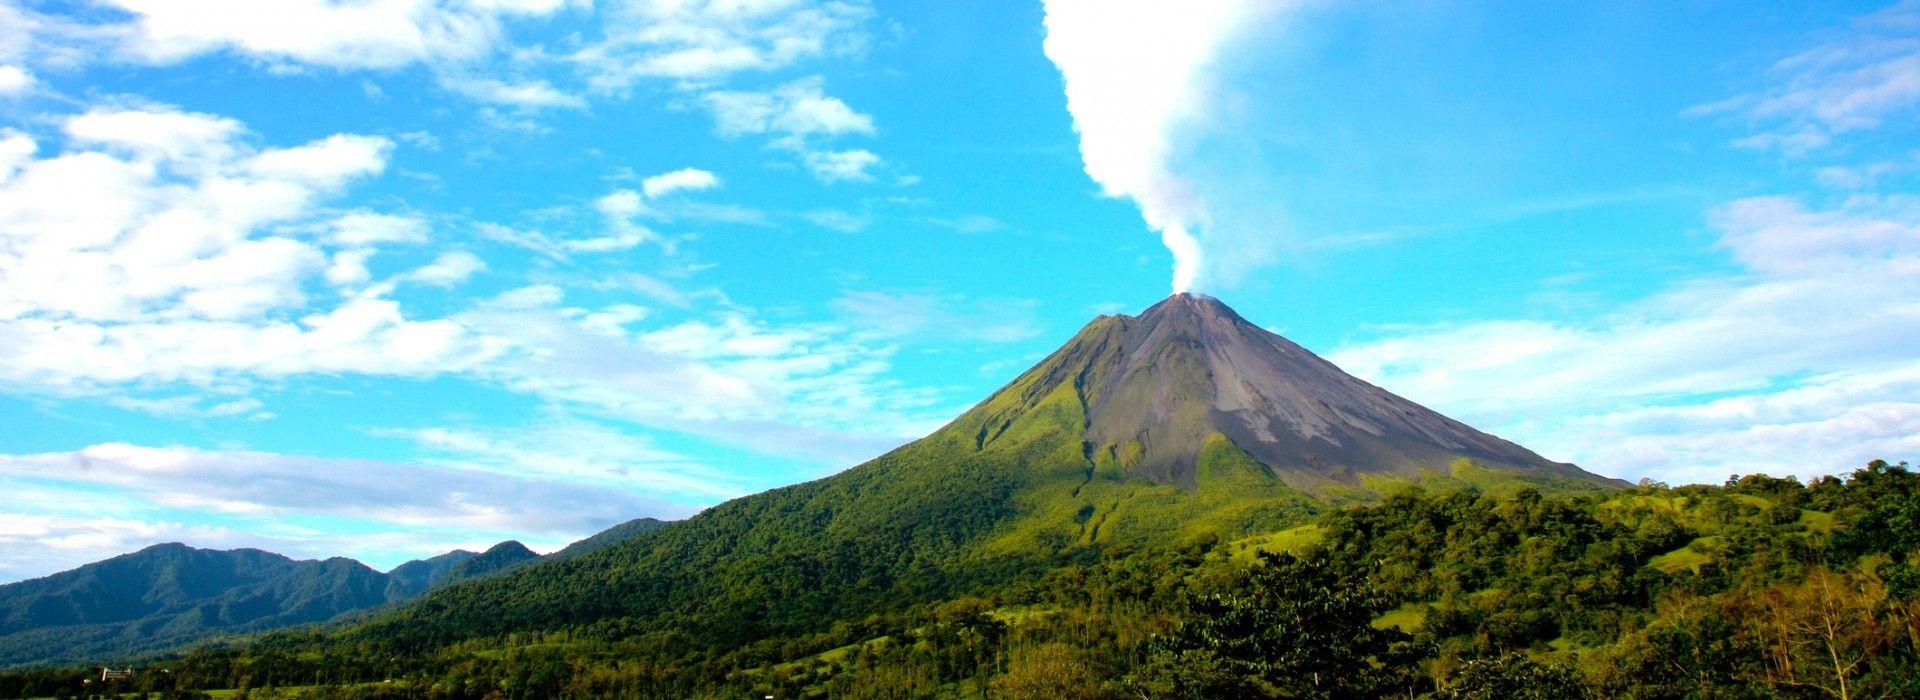 Volunteering Tours in Costa Rica